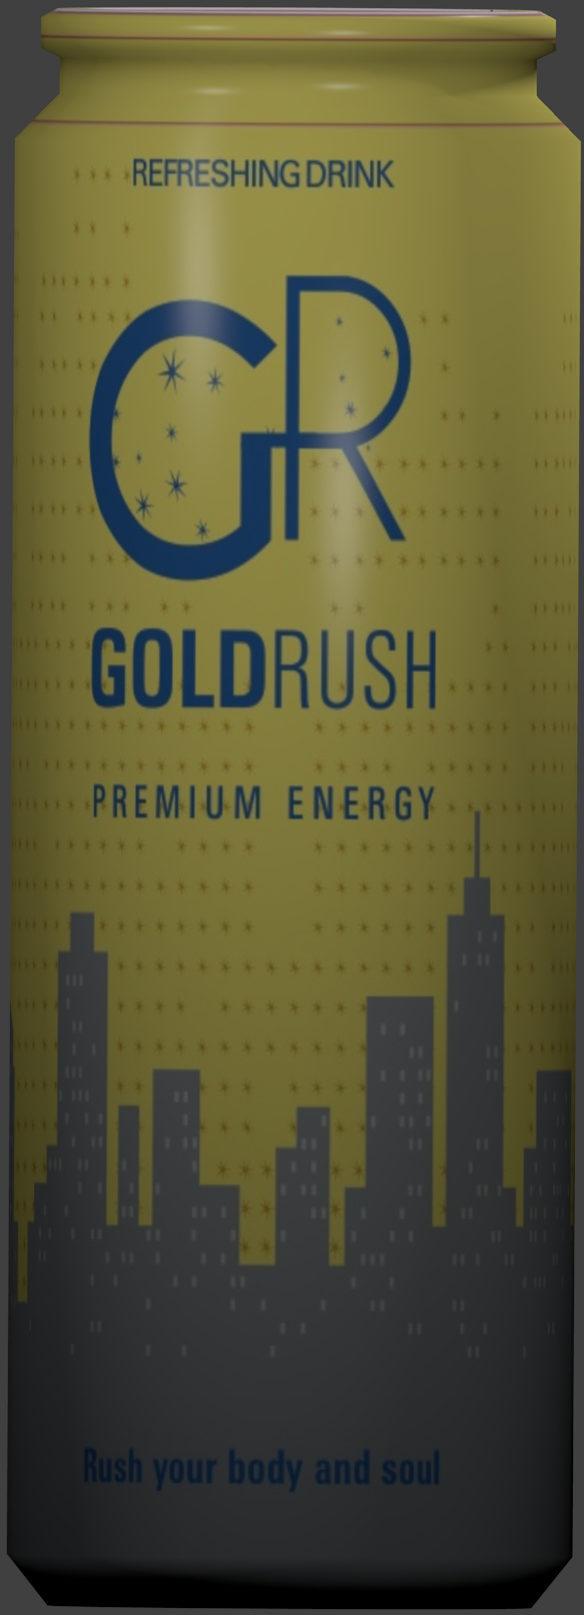 GR GOLDRUSH - Ingredients - fr